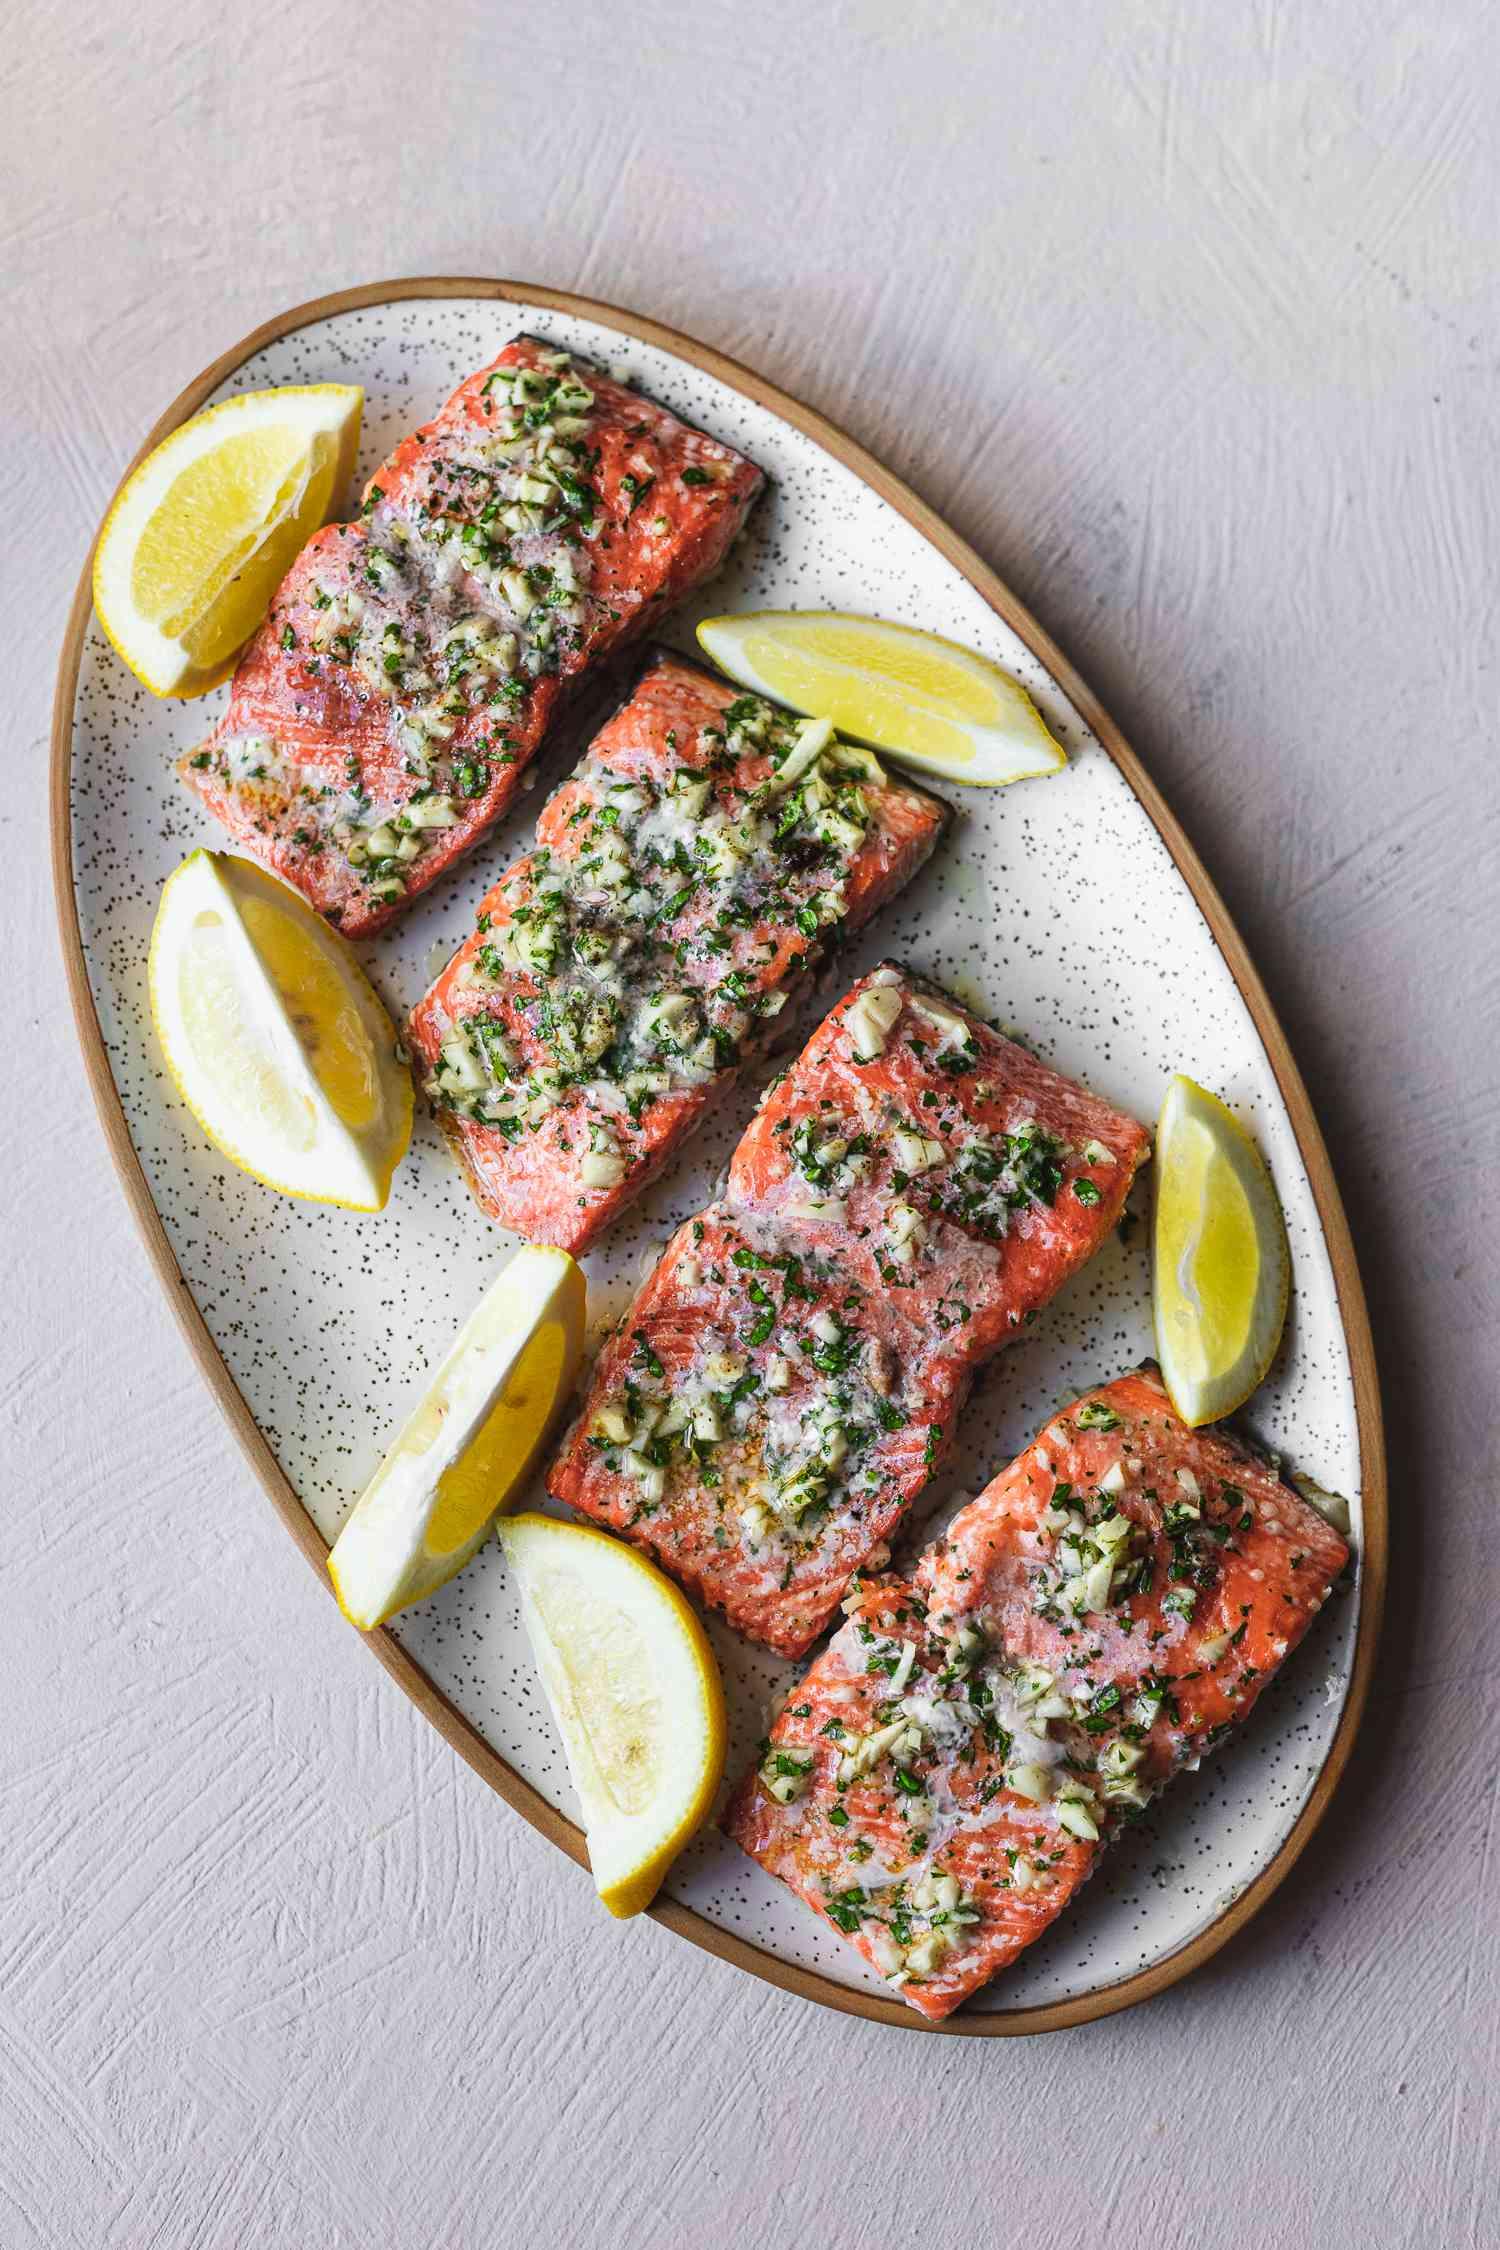 Baked salmon and garlic